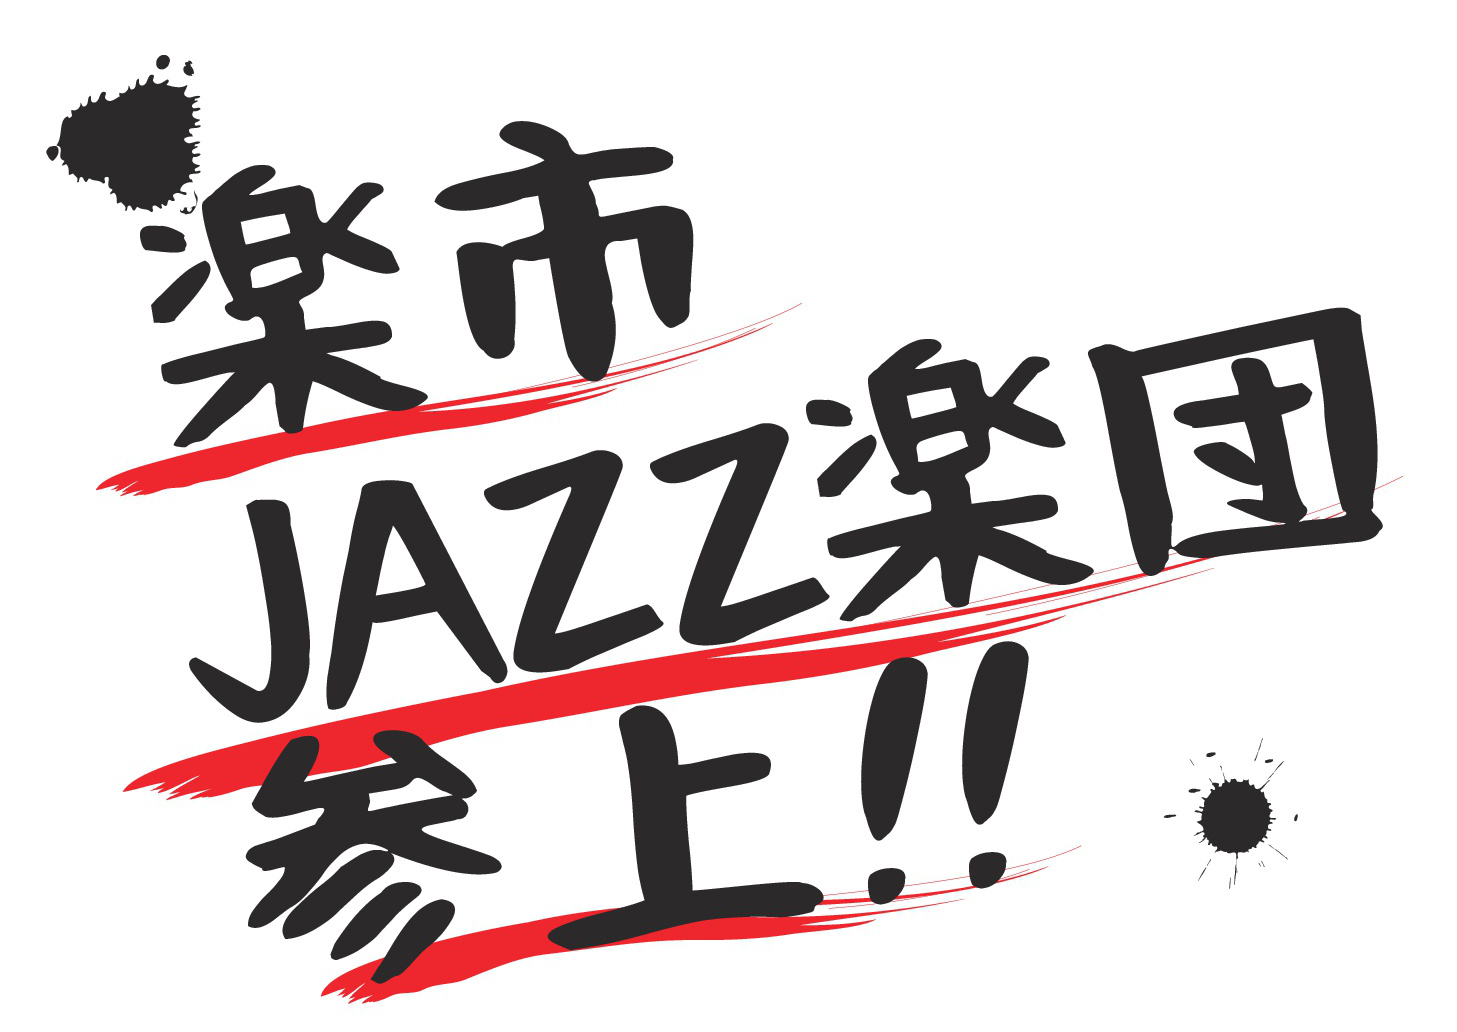 we love jazz ♥